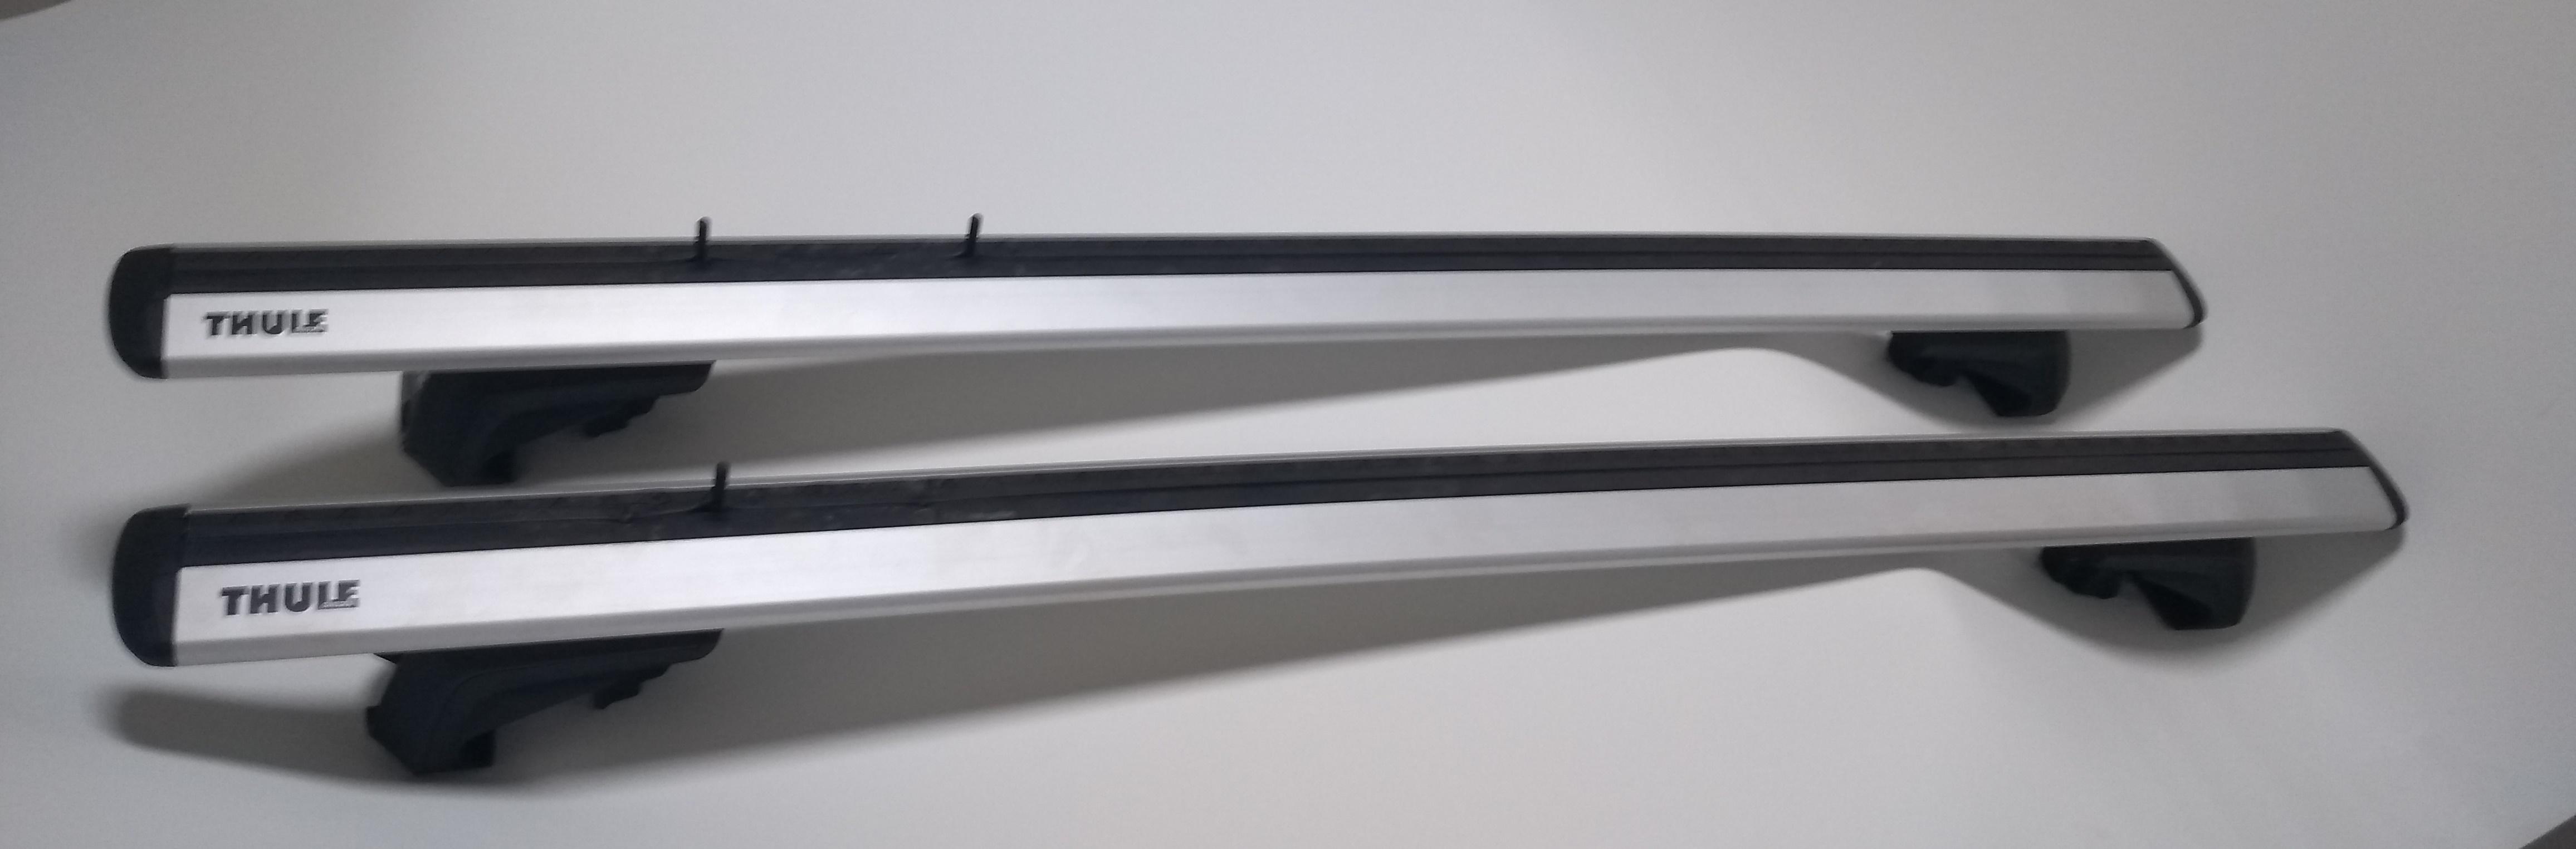 galeria Rack De Teto Thule - Sandereo Stepway